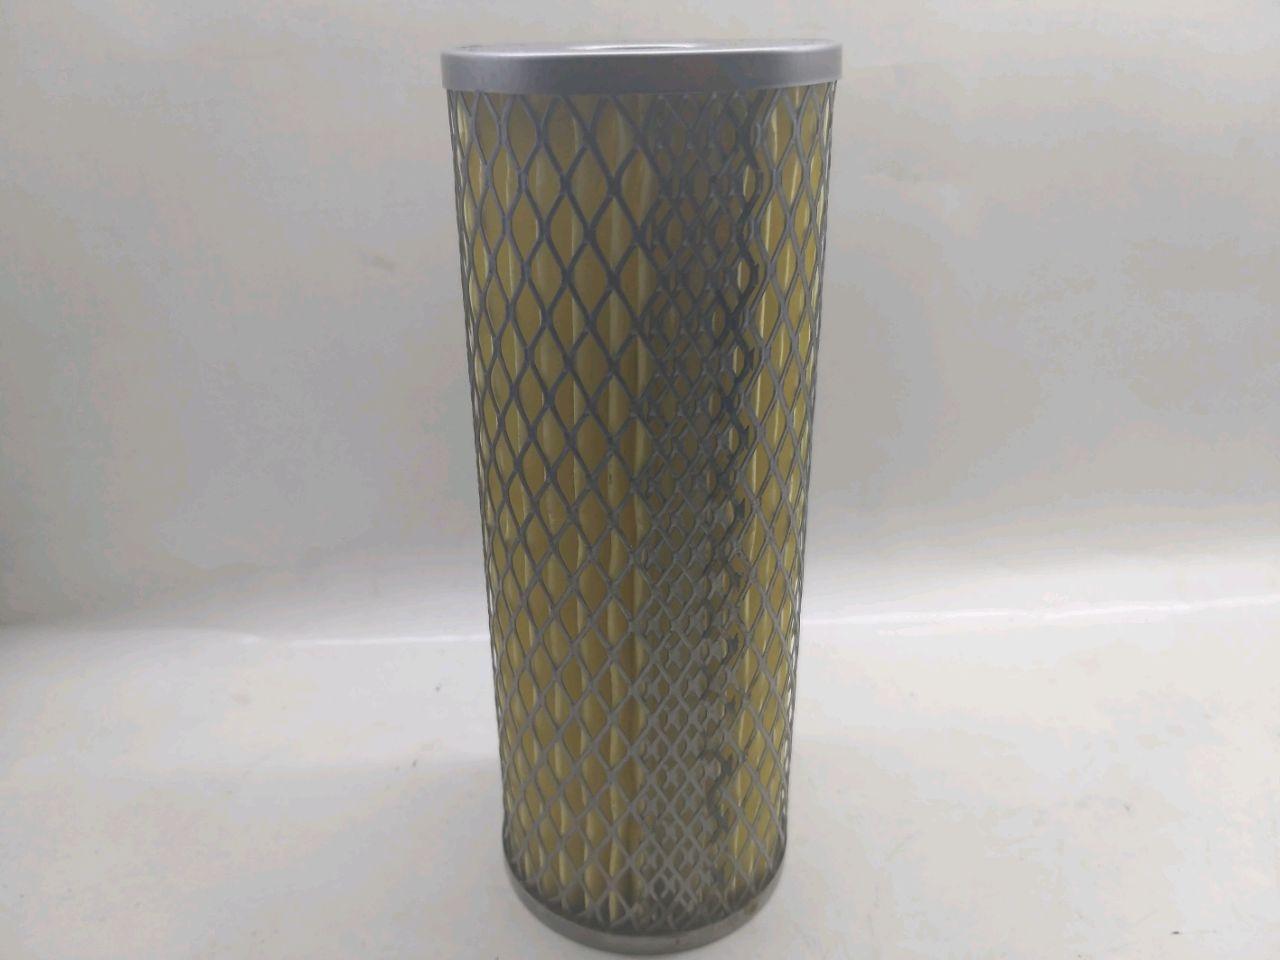 Filtru brut de combustibil MAZ (RD-019) (Motorex)